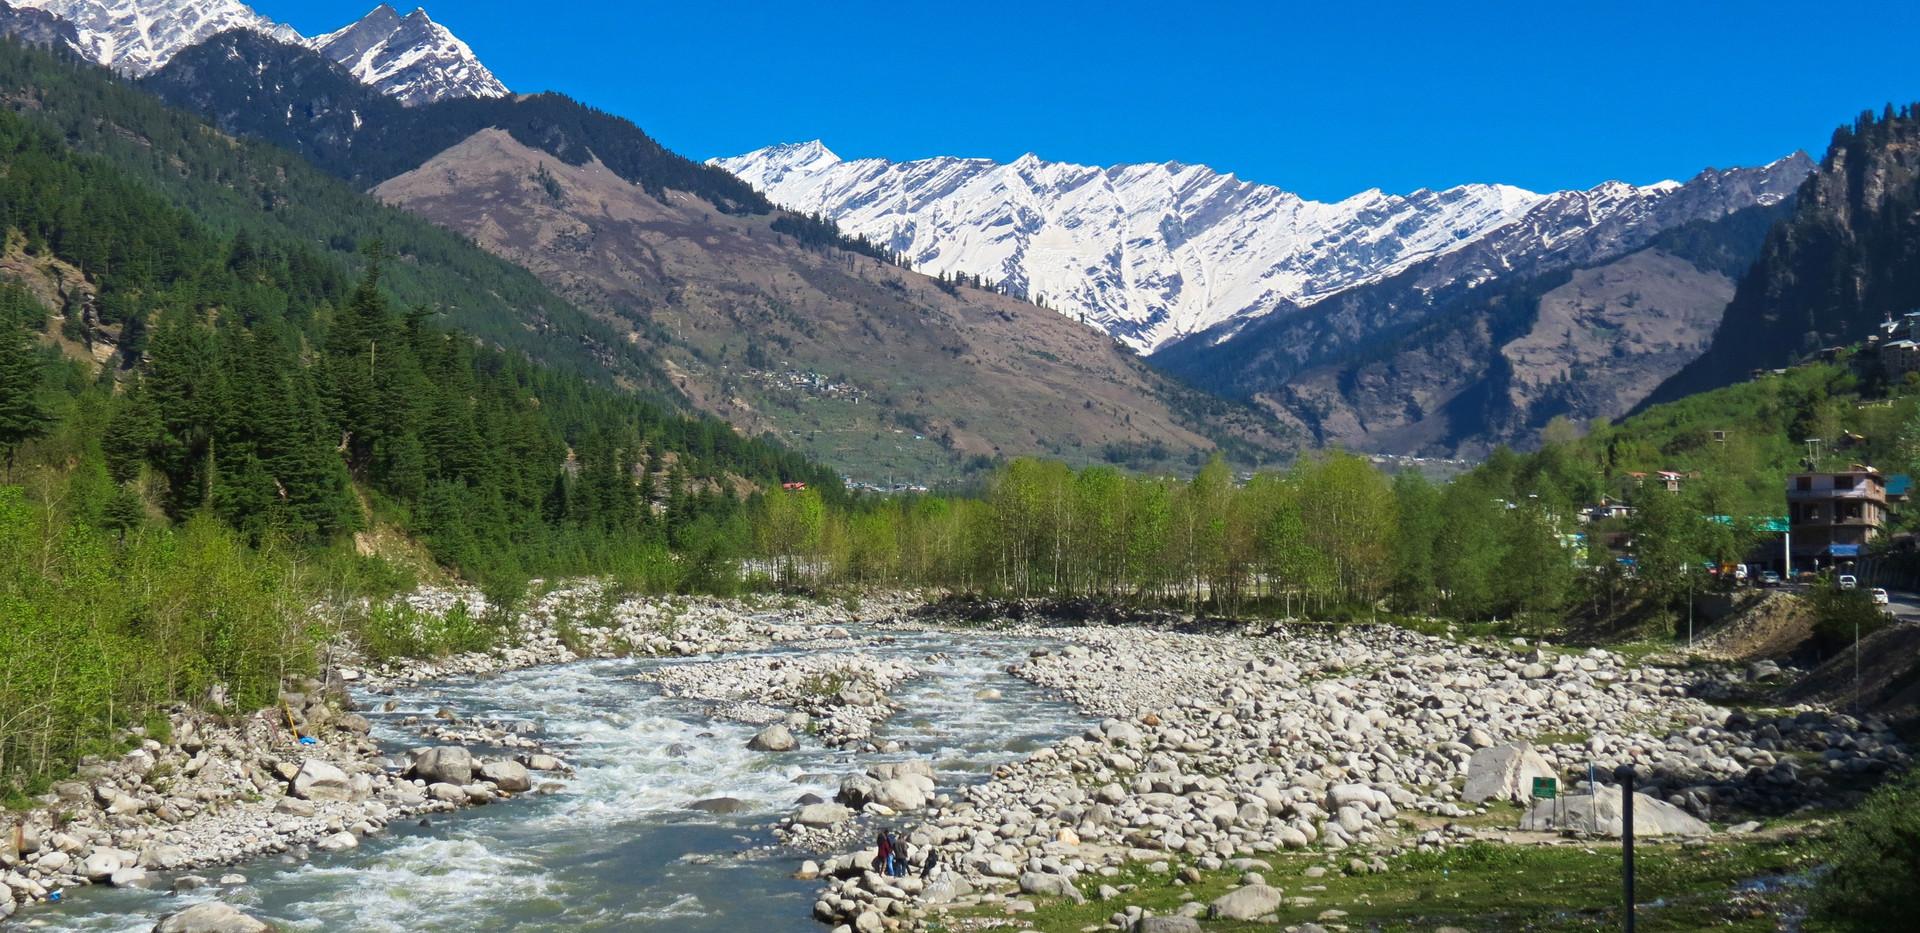 manali-India Snowlion expeditions.jpg